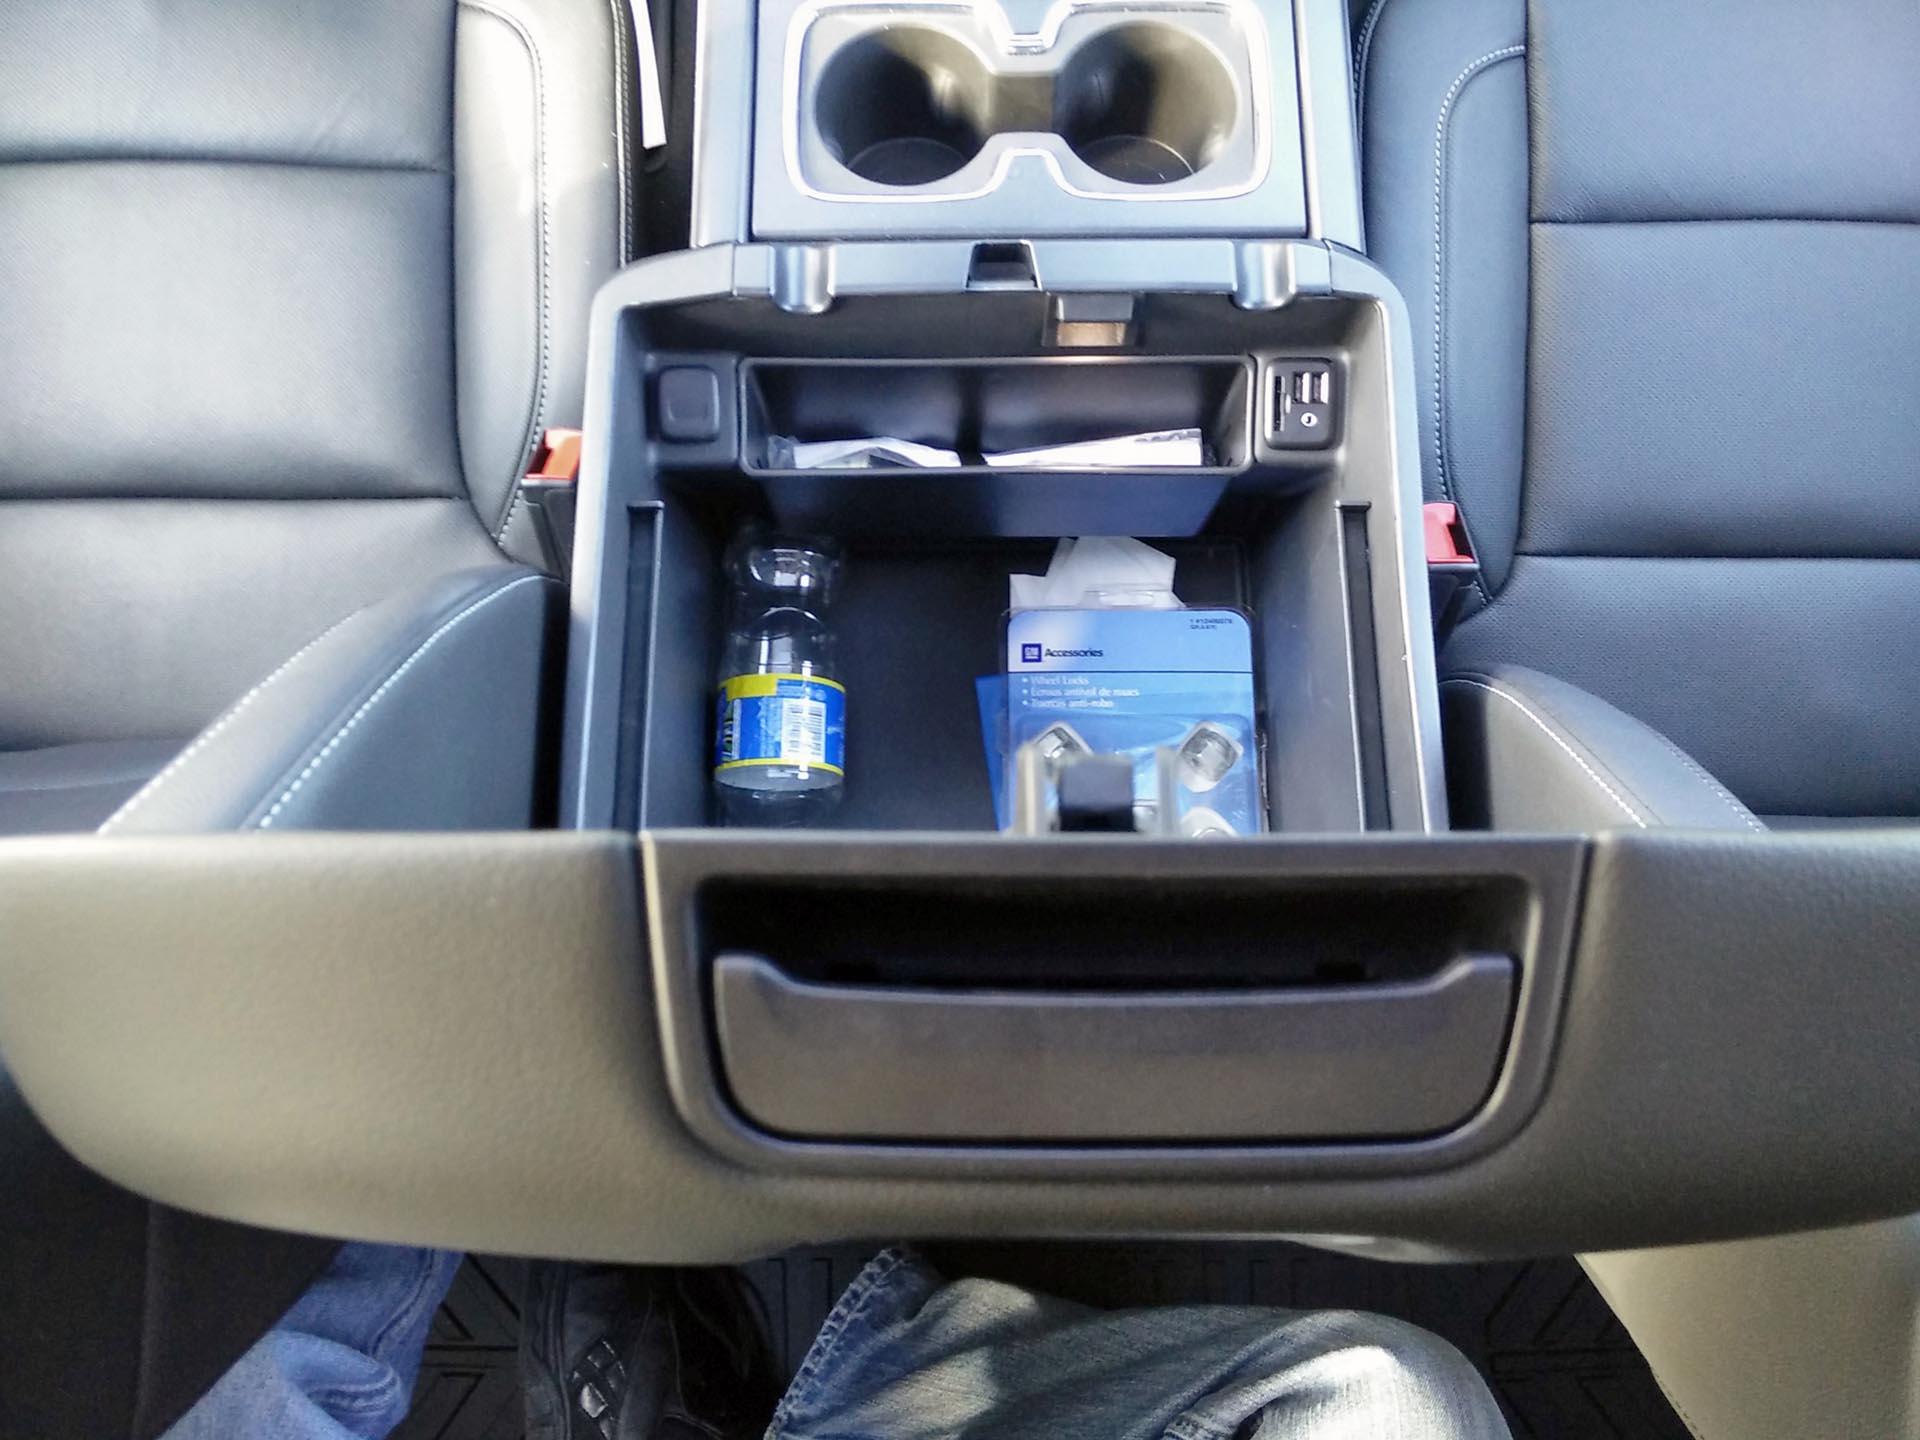 2015 Chevrolet Silverado 1500 4wd Crew Cab Ltz Chevy Center Console